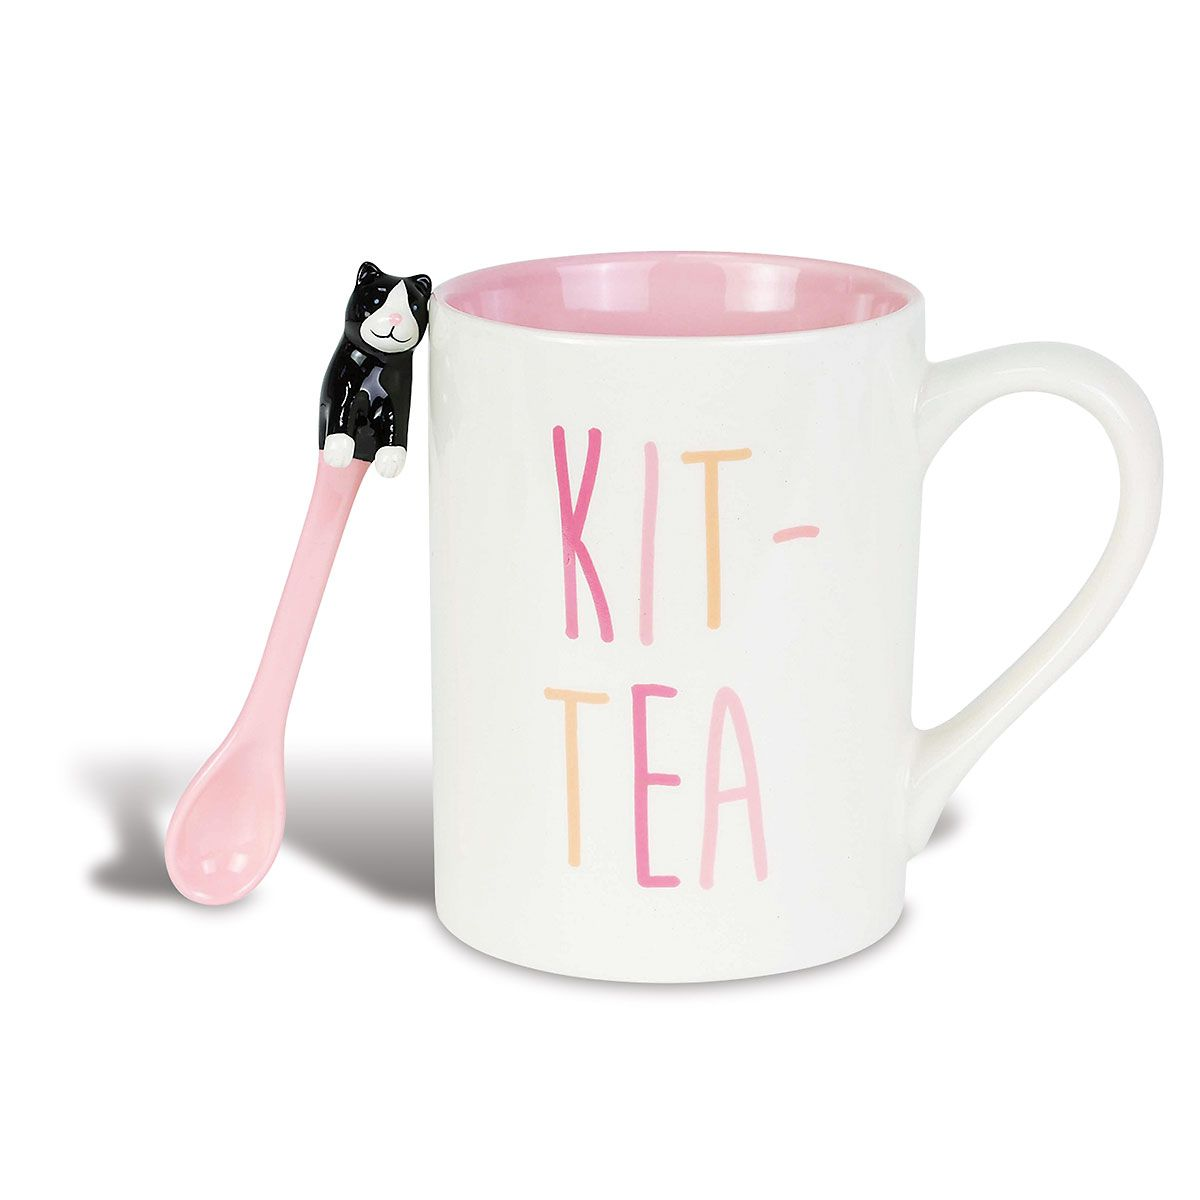 Kit-tea Mug with Spoon